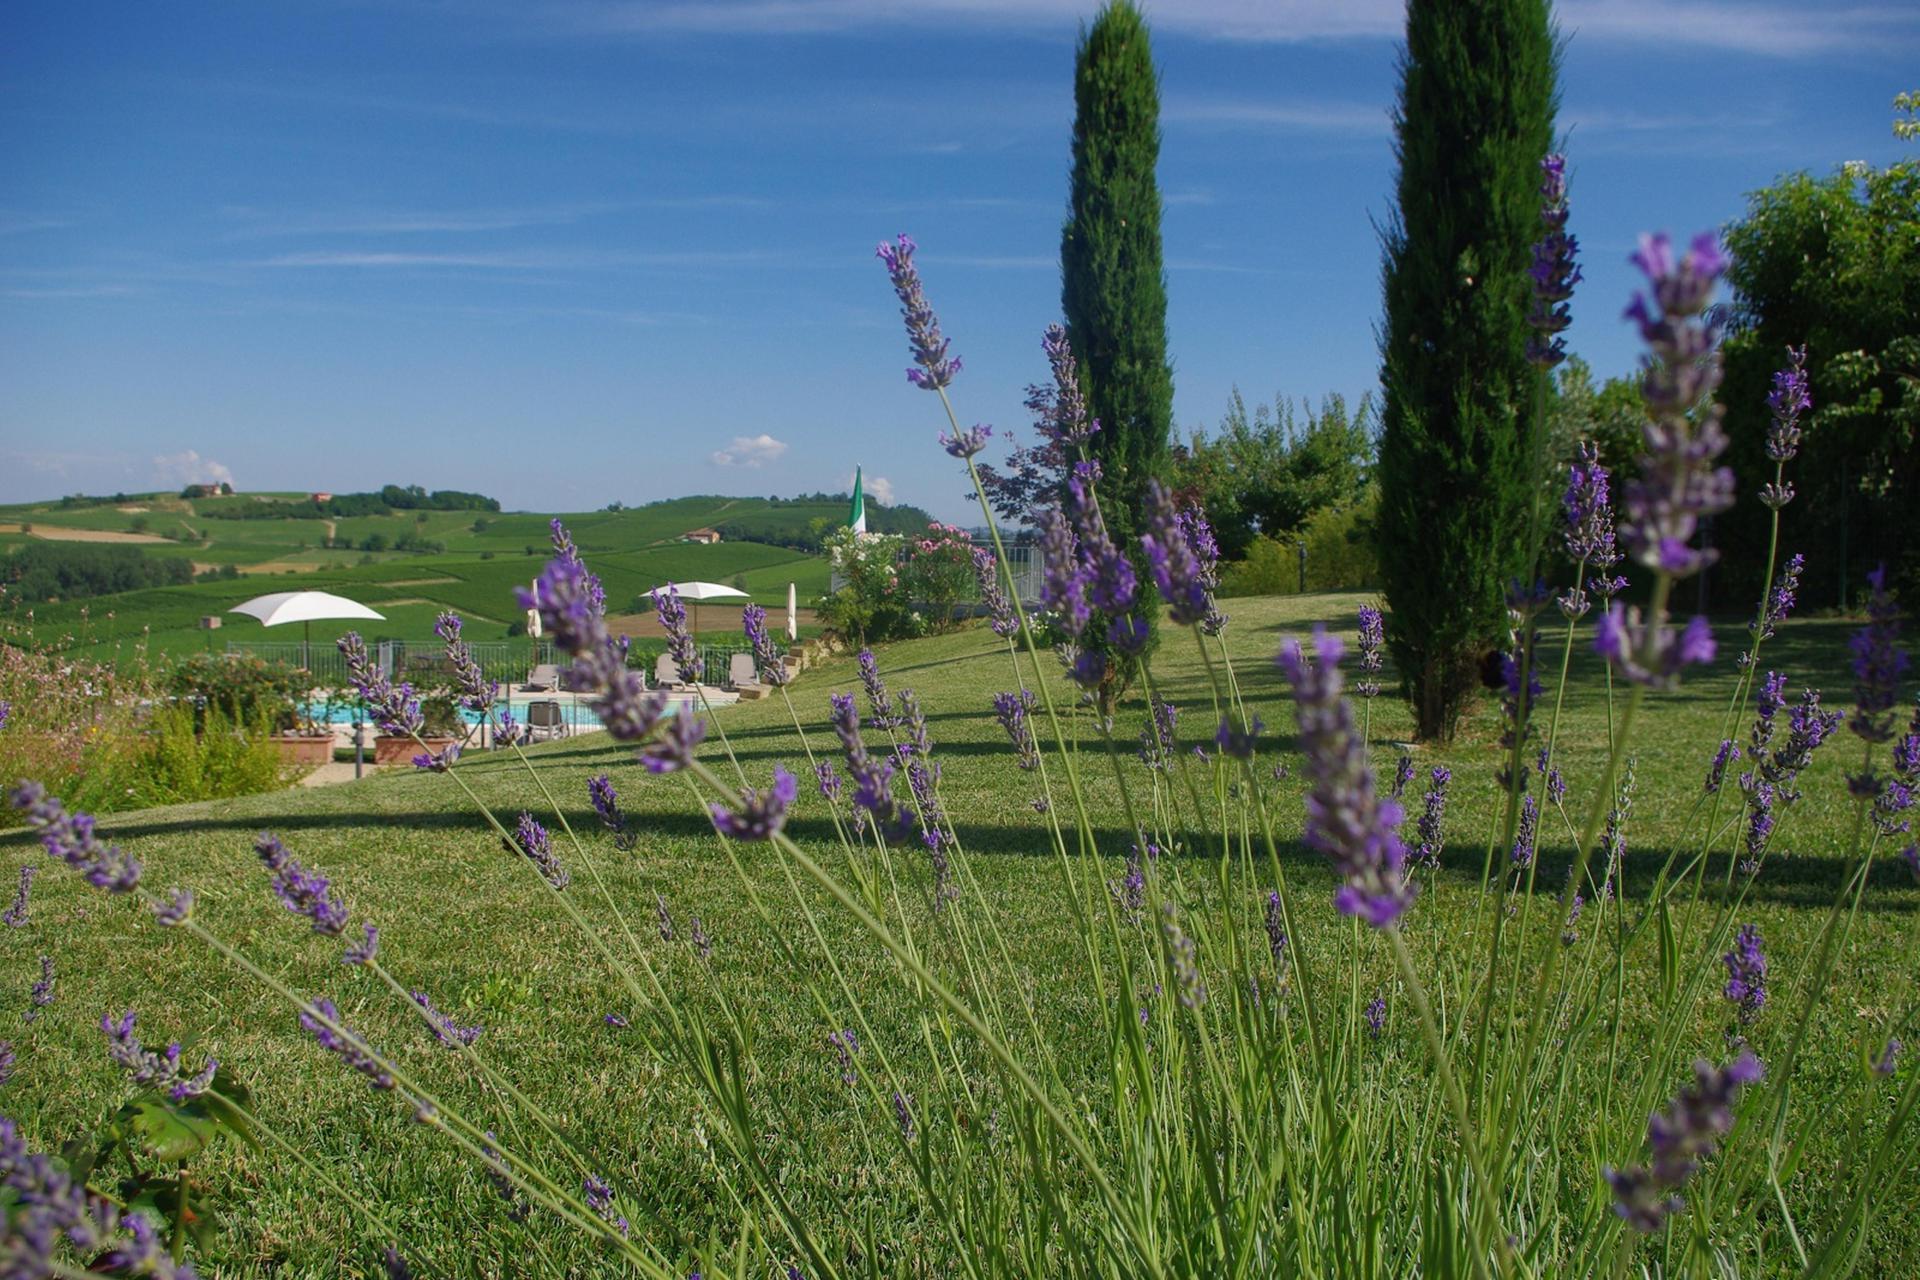 Agriturismo Piemonte Romantische agriturismo in de heuvels van Piemonte